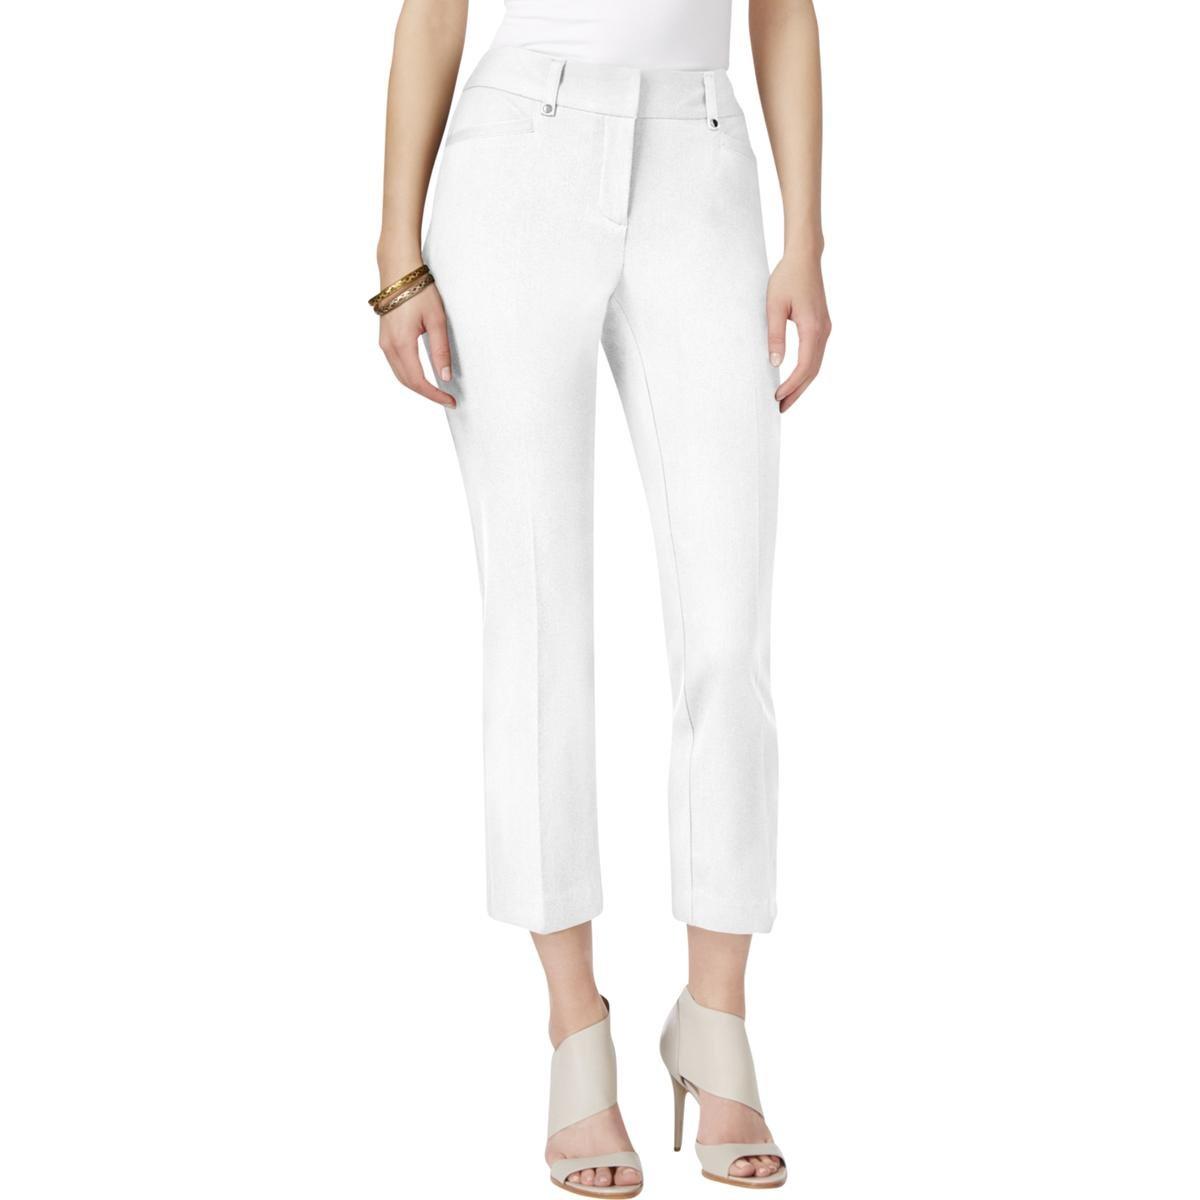 c0ba62a39bf93 Alfani Womens Plus Twill Tummy Control Capri Pants White 18 at Amazon  Women s Clothing store